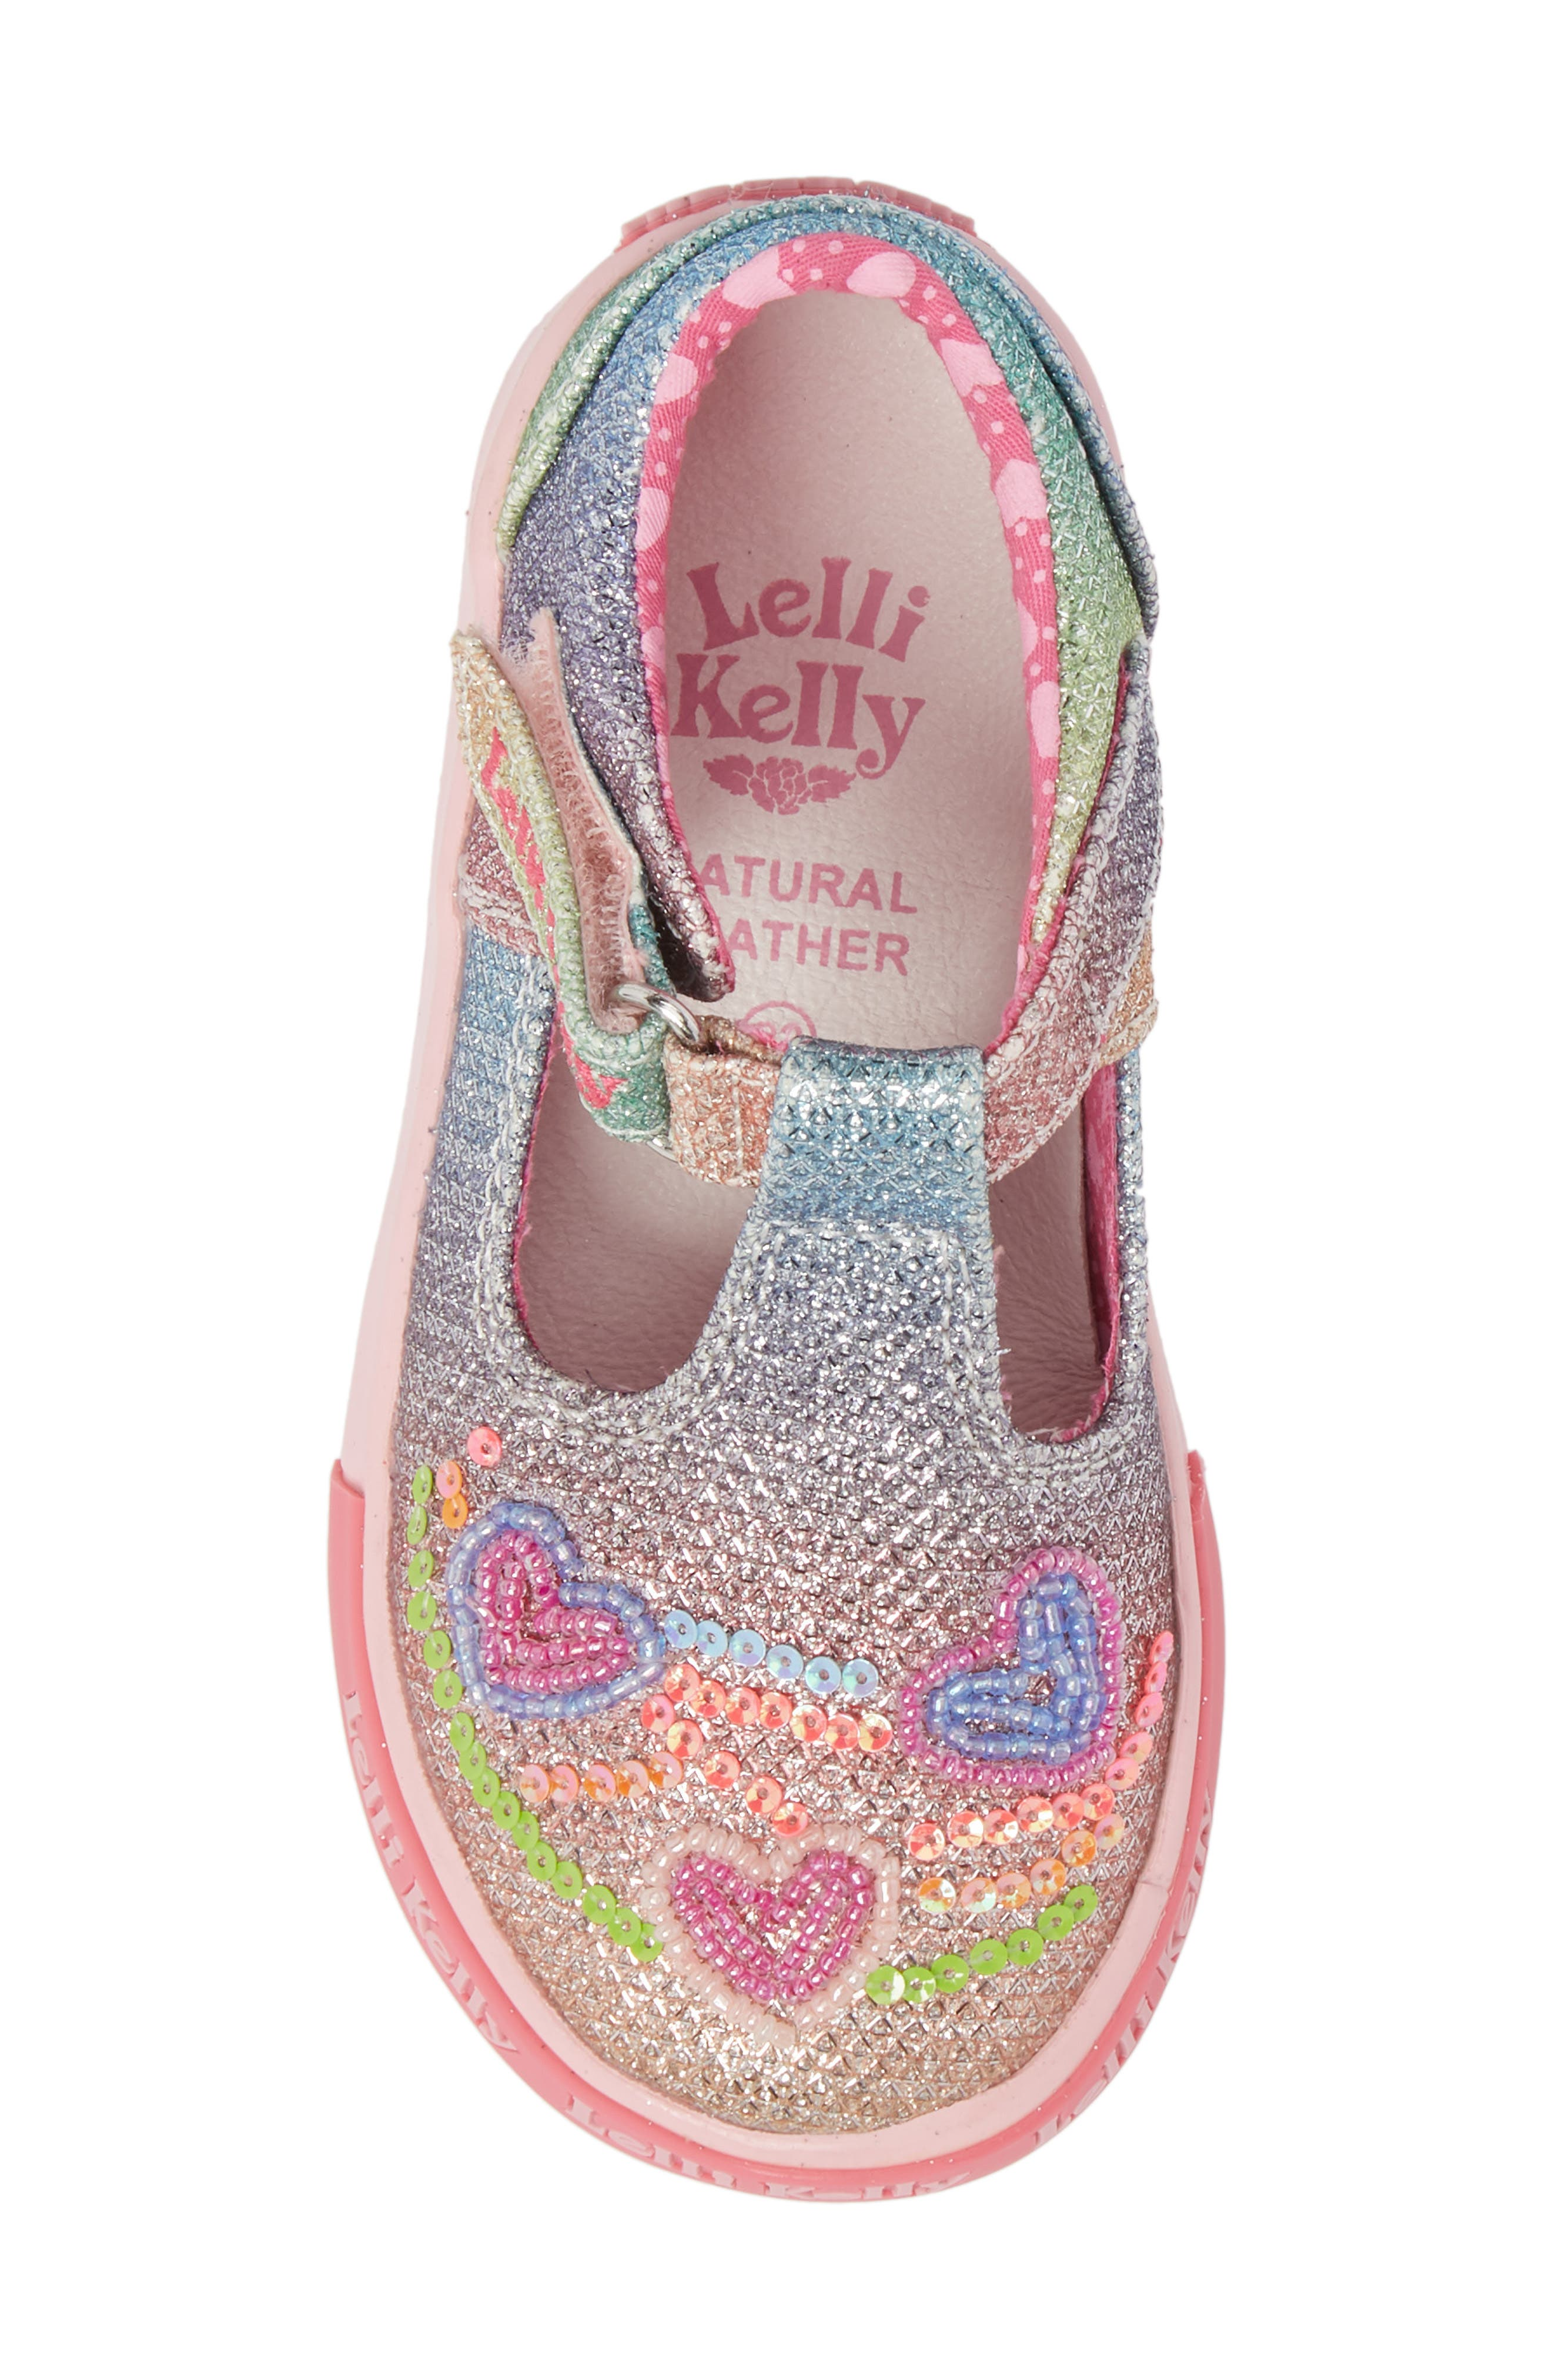 LELLI KELLY,                             Glitter Metallic T-Strap Mary Jane,                             Alternate thumbnail 5, color,                             320